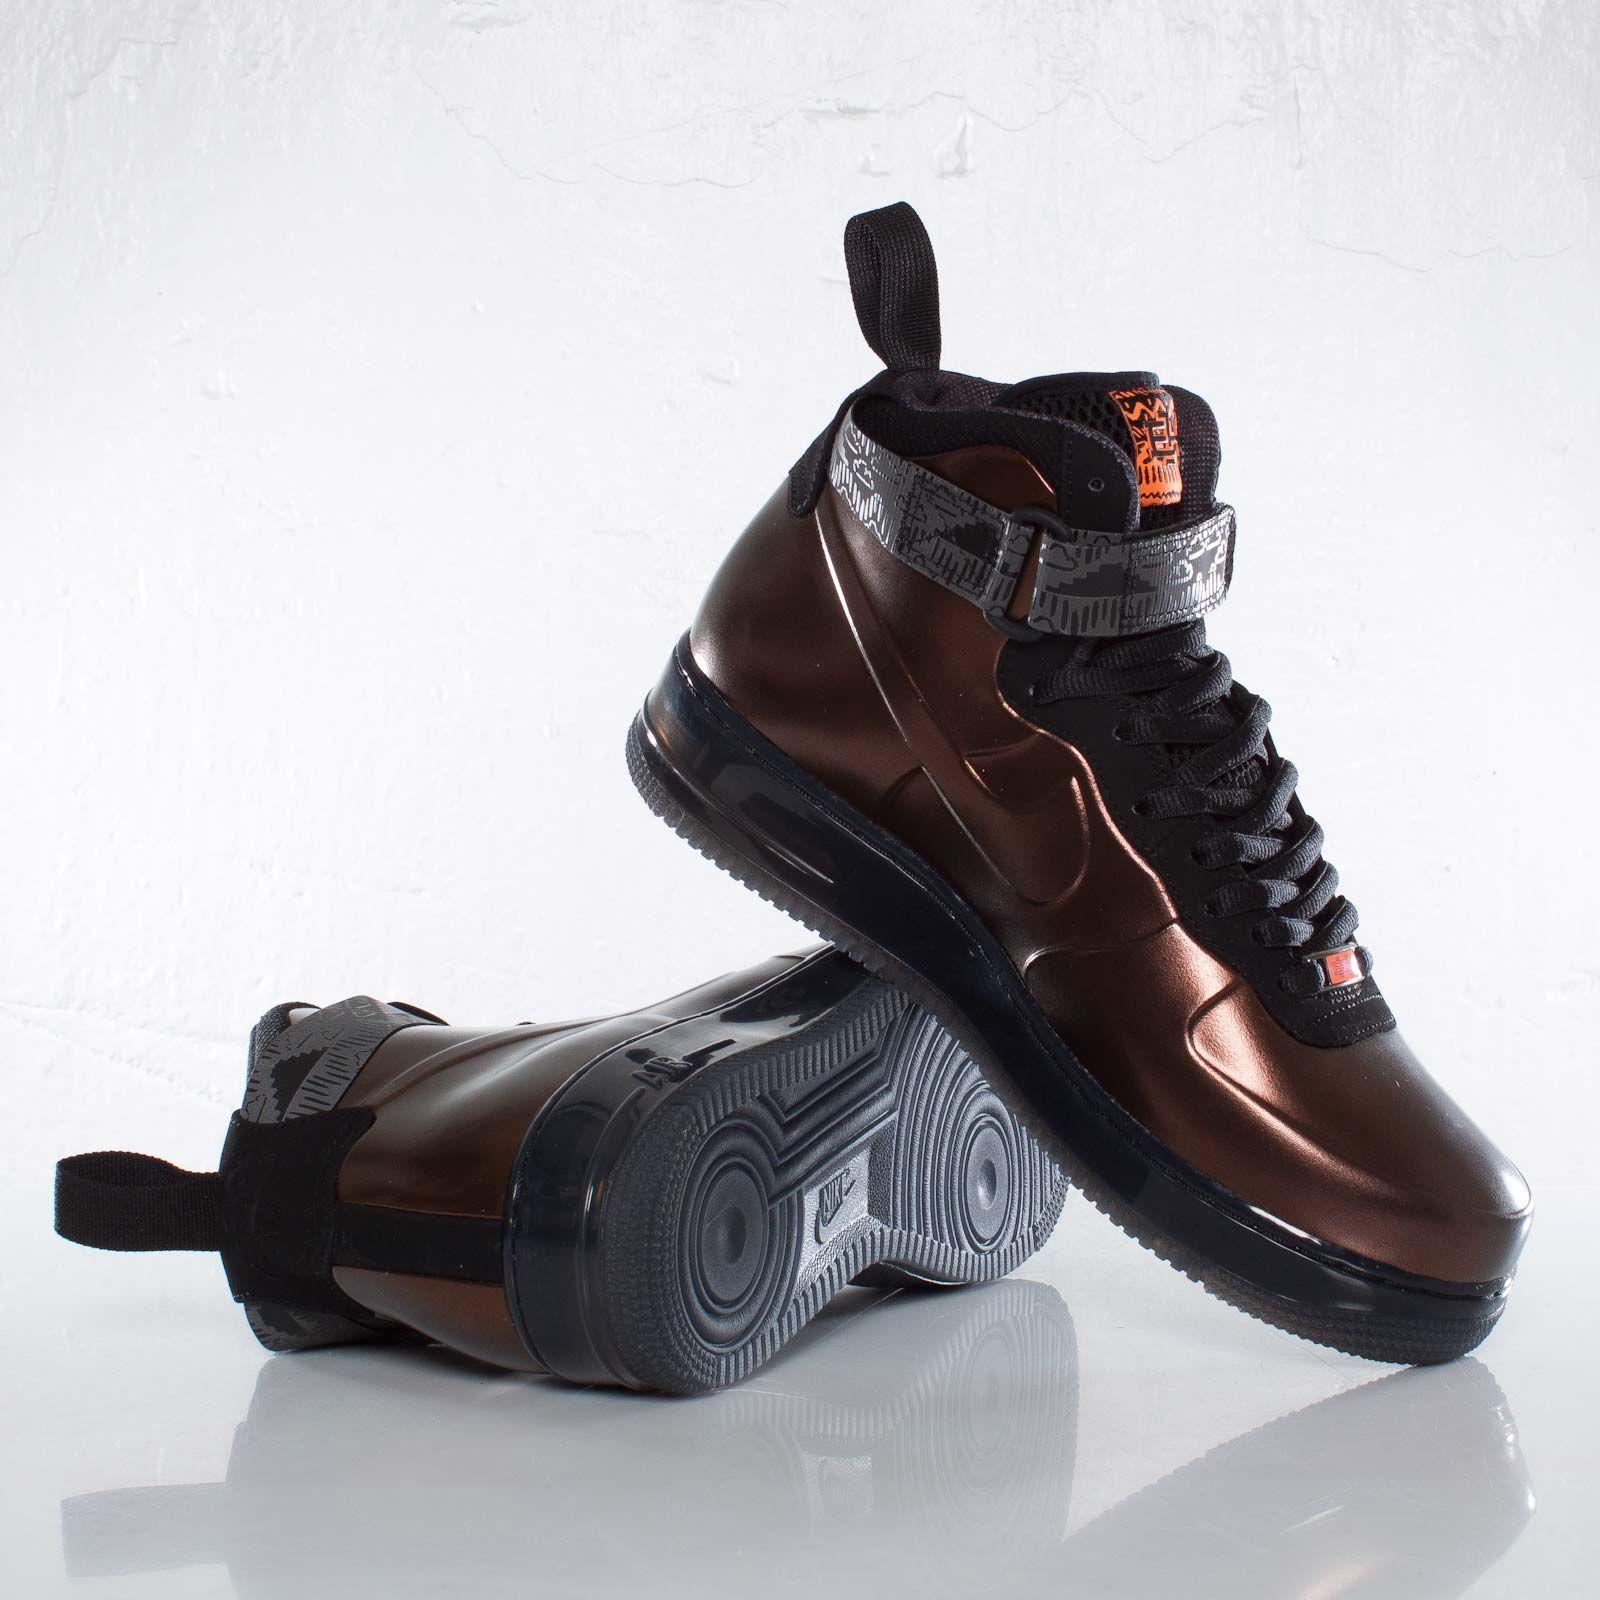 #Nike #AirForce #1 #Foamposite #BHM